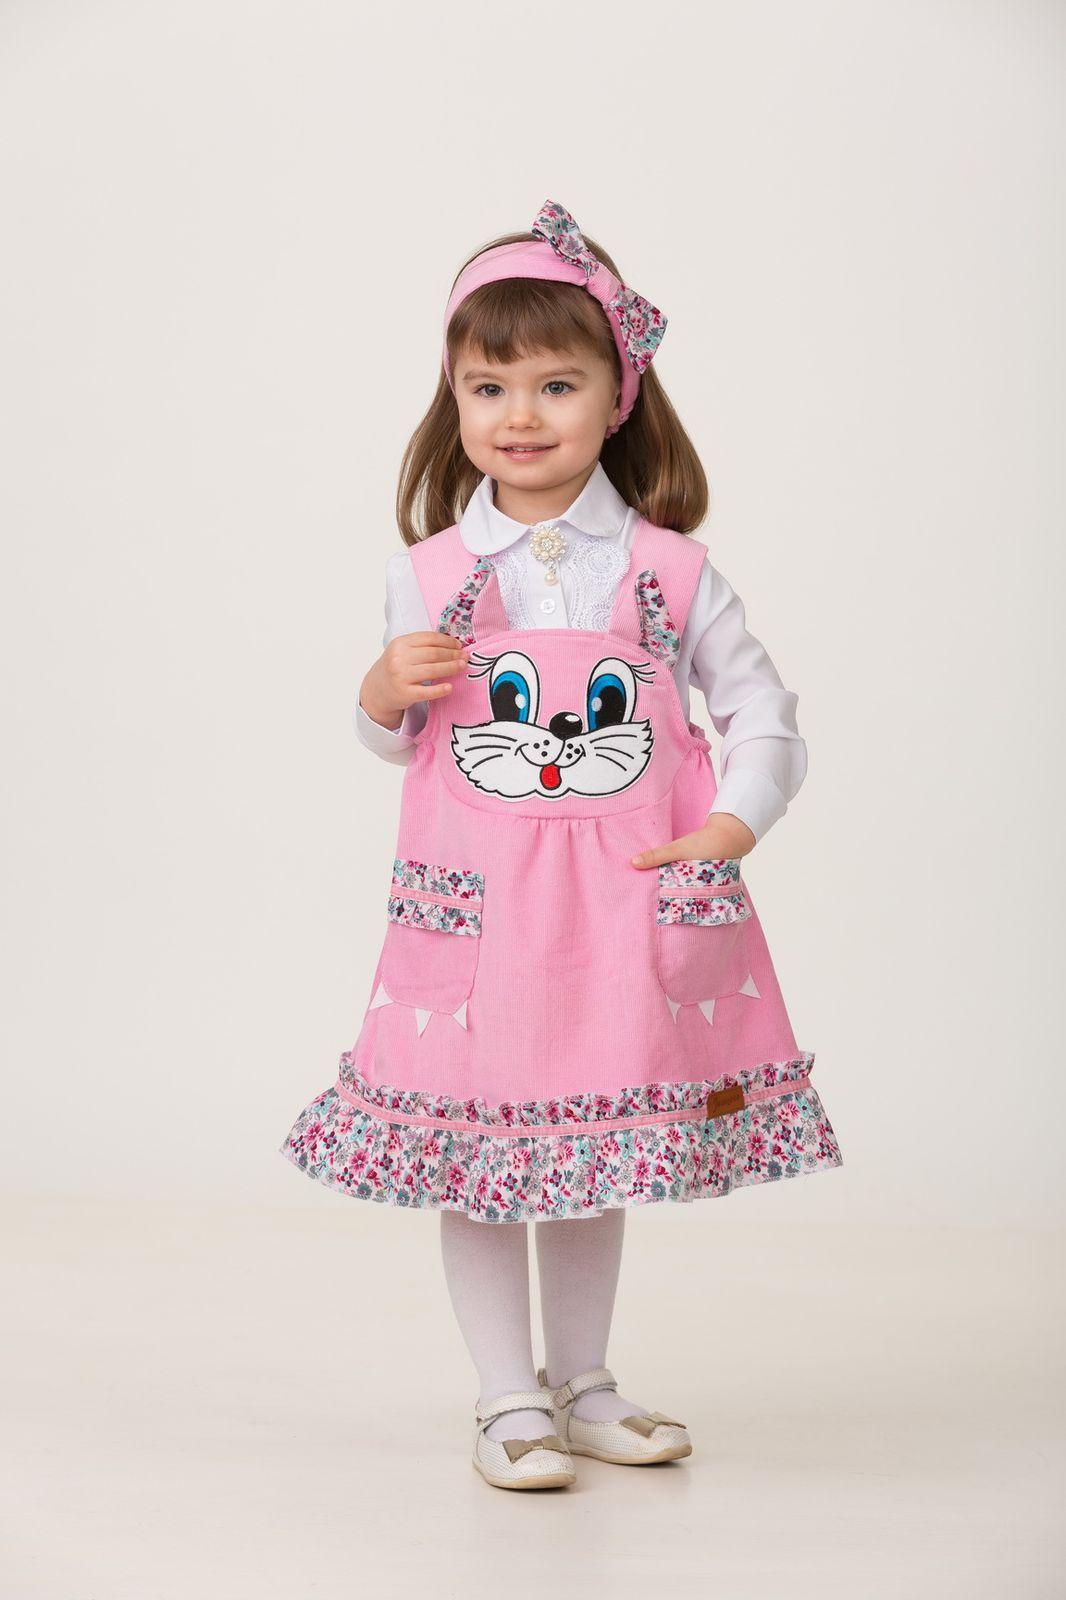 Карнавальный костюм Jeanees Кошечка Царапка, цвет: розовый. Размер: 26 jeanees карнавальный костюм врач jeanees